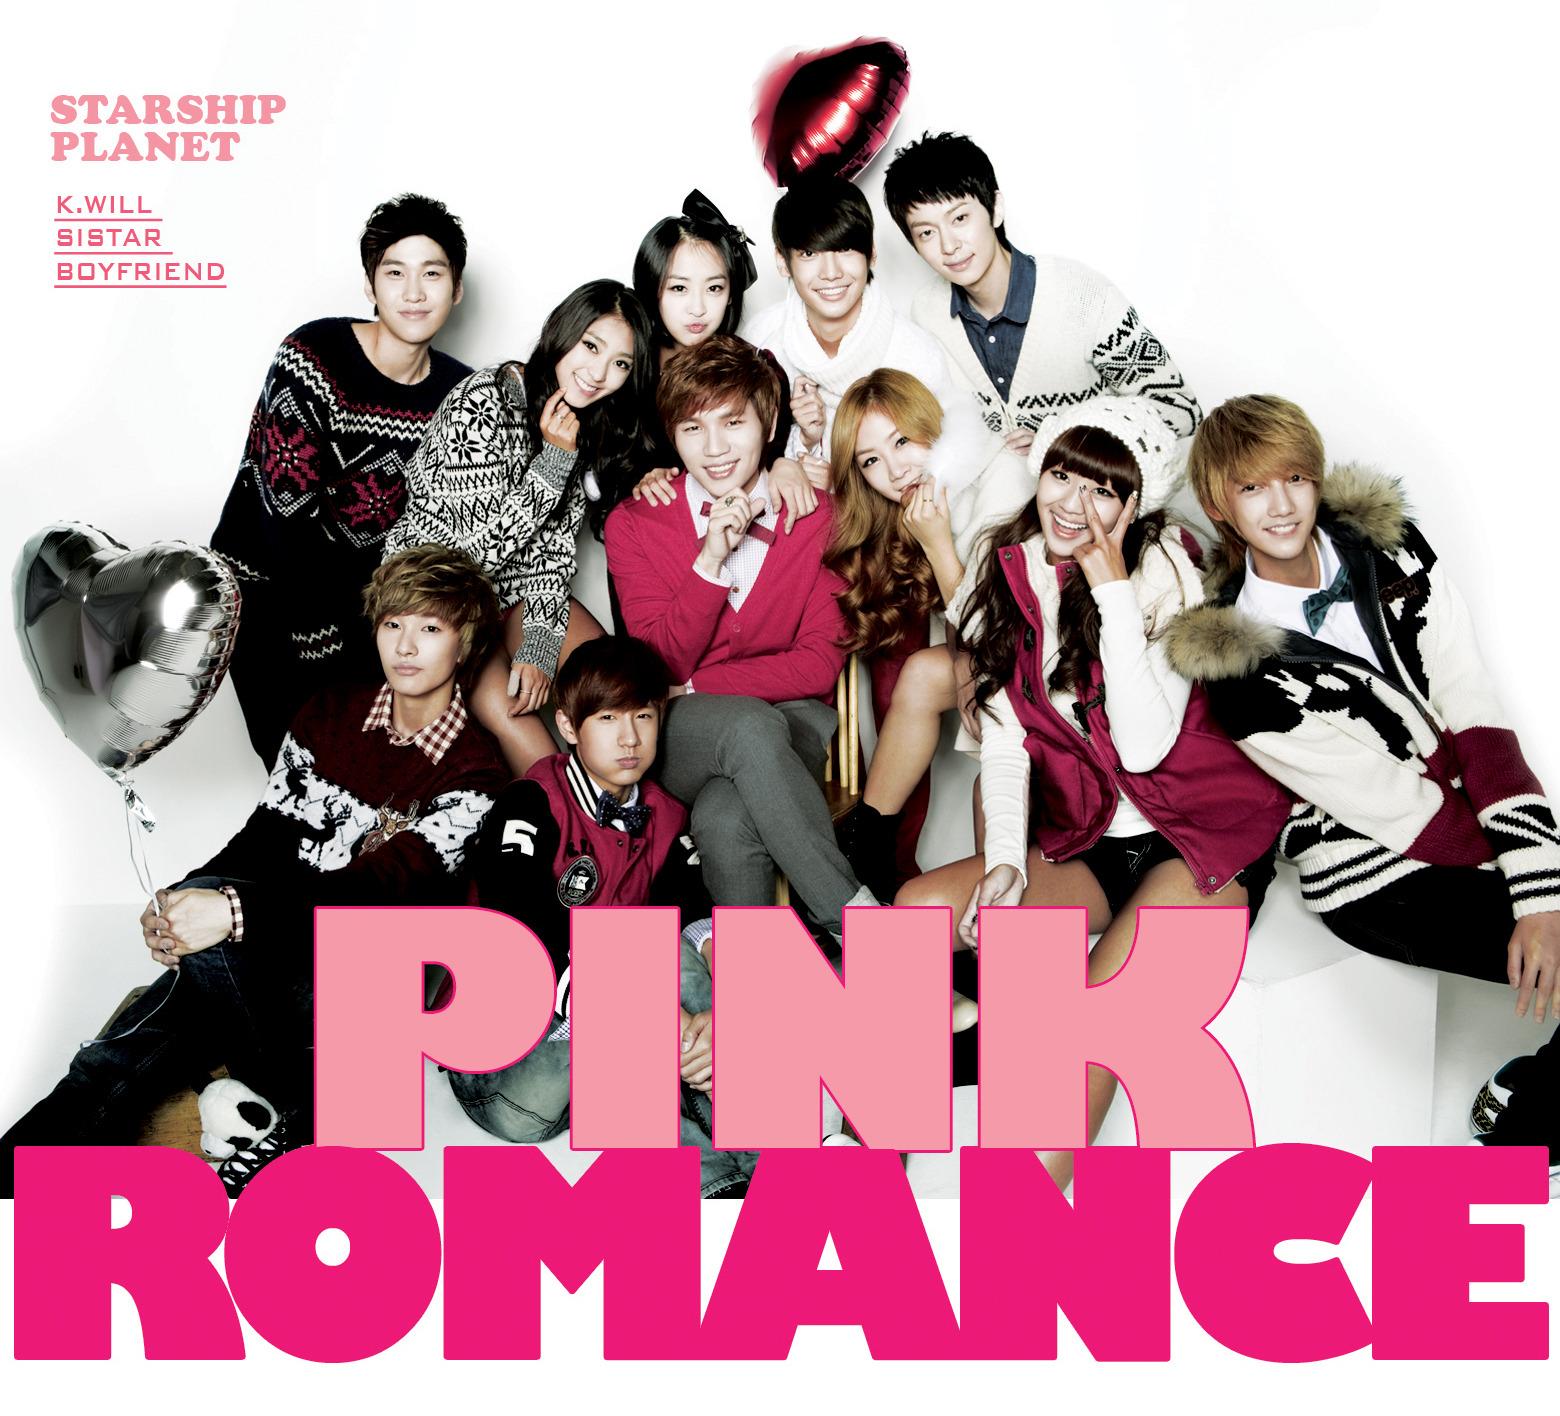 STARSHIP PLANET pink romance